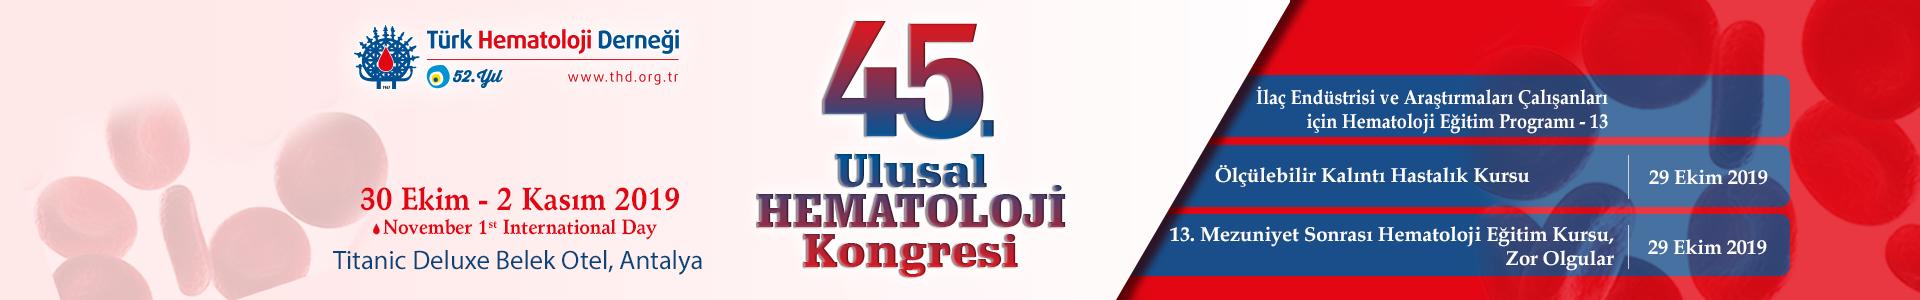 45. Ulusal Hematoloji Kongresi 2019